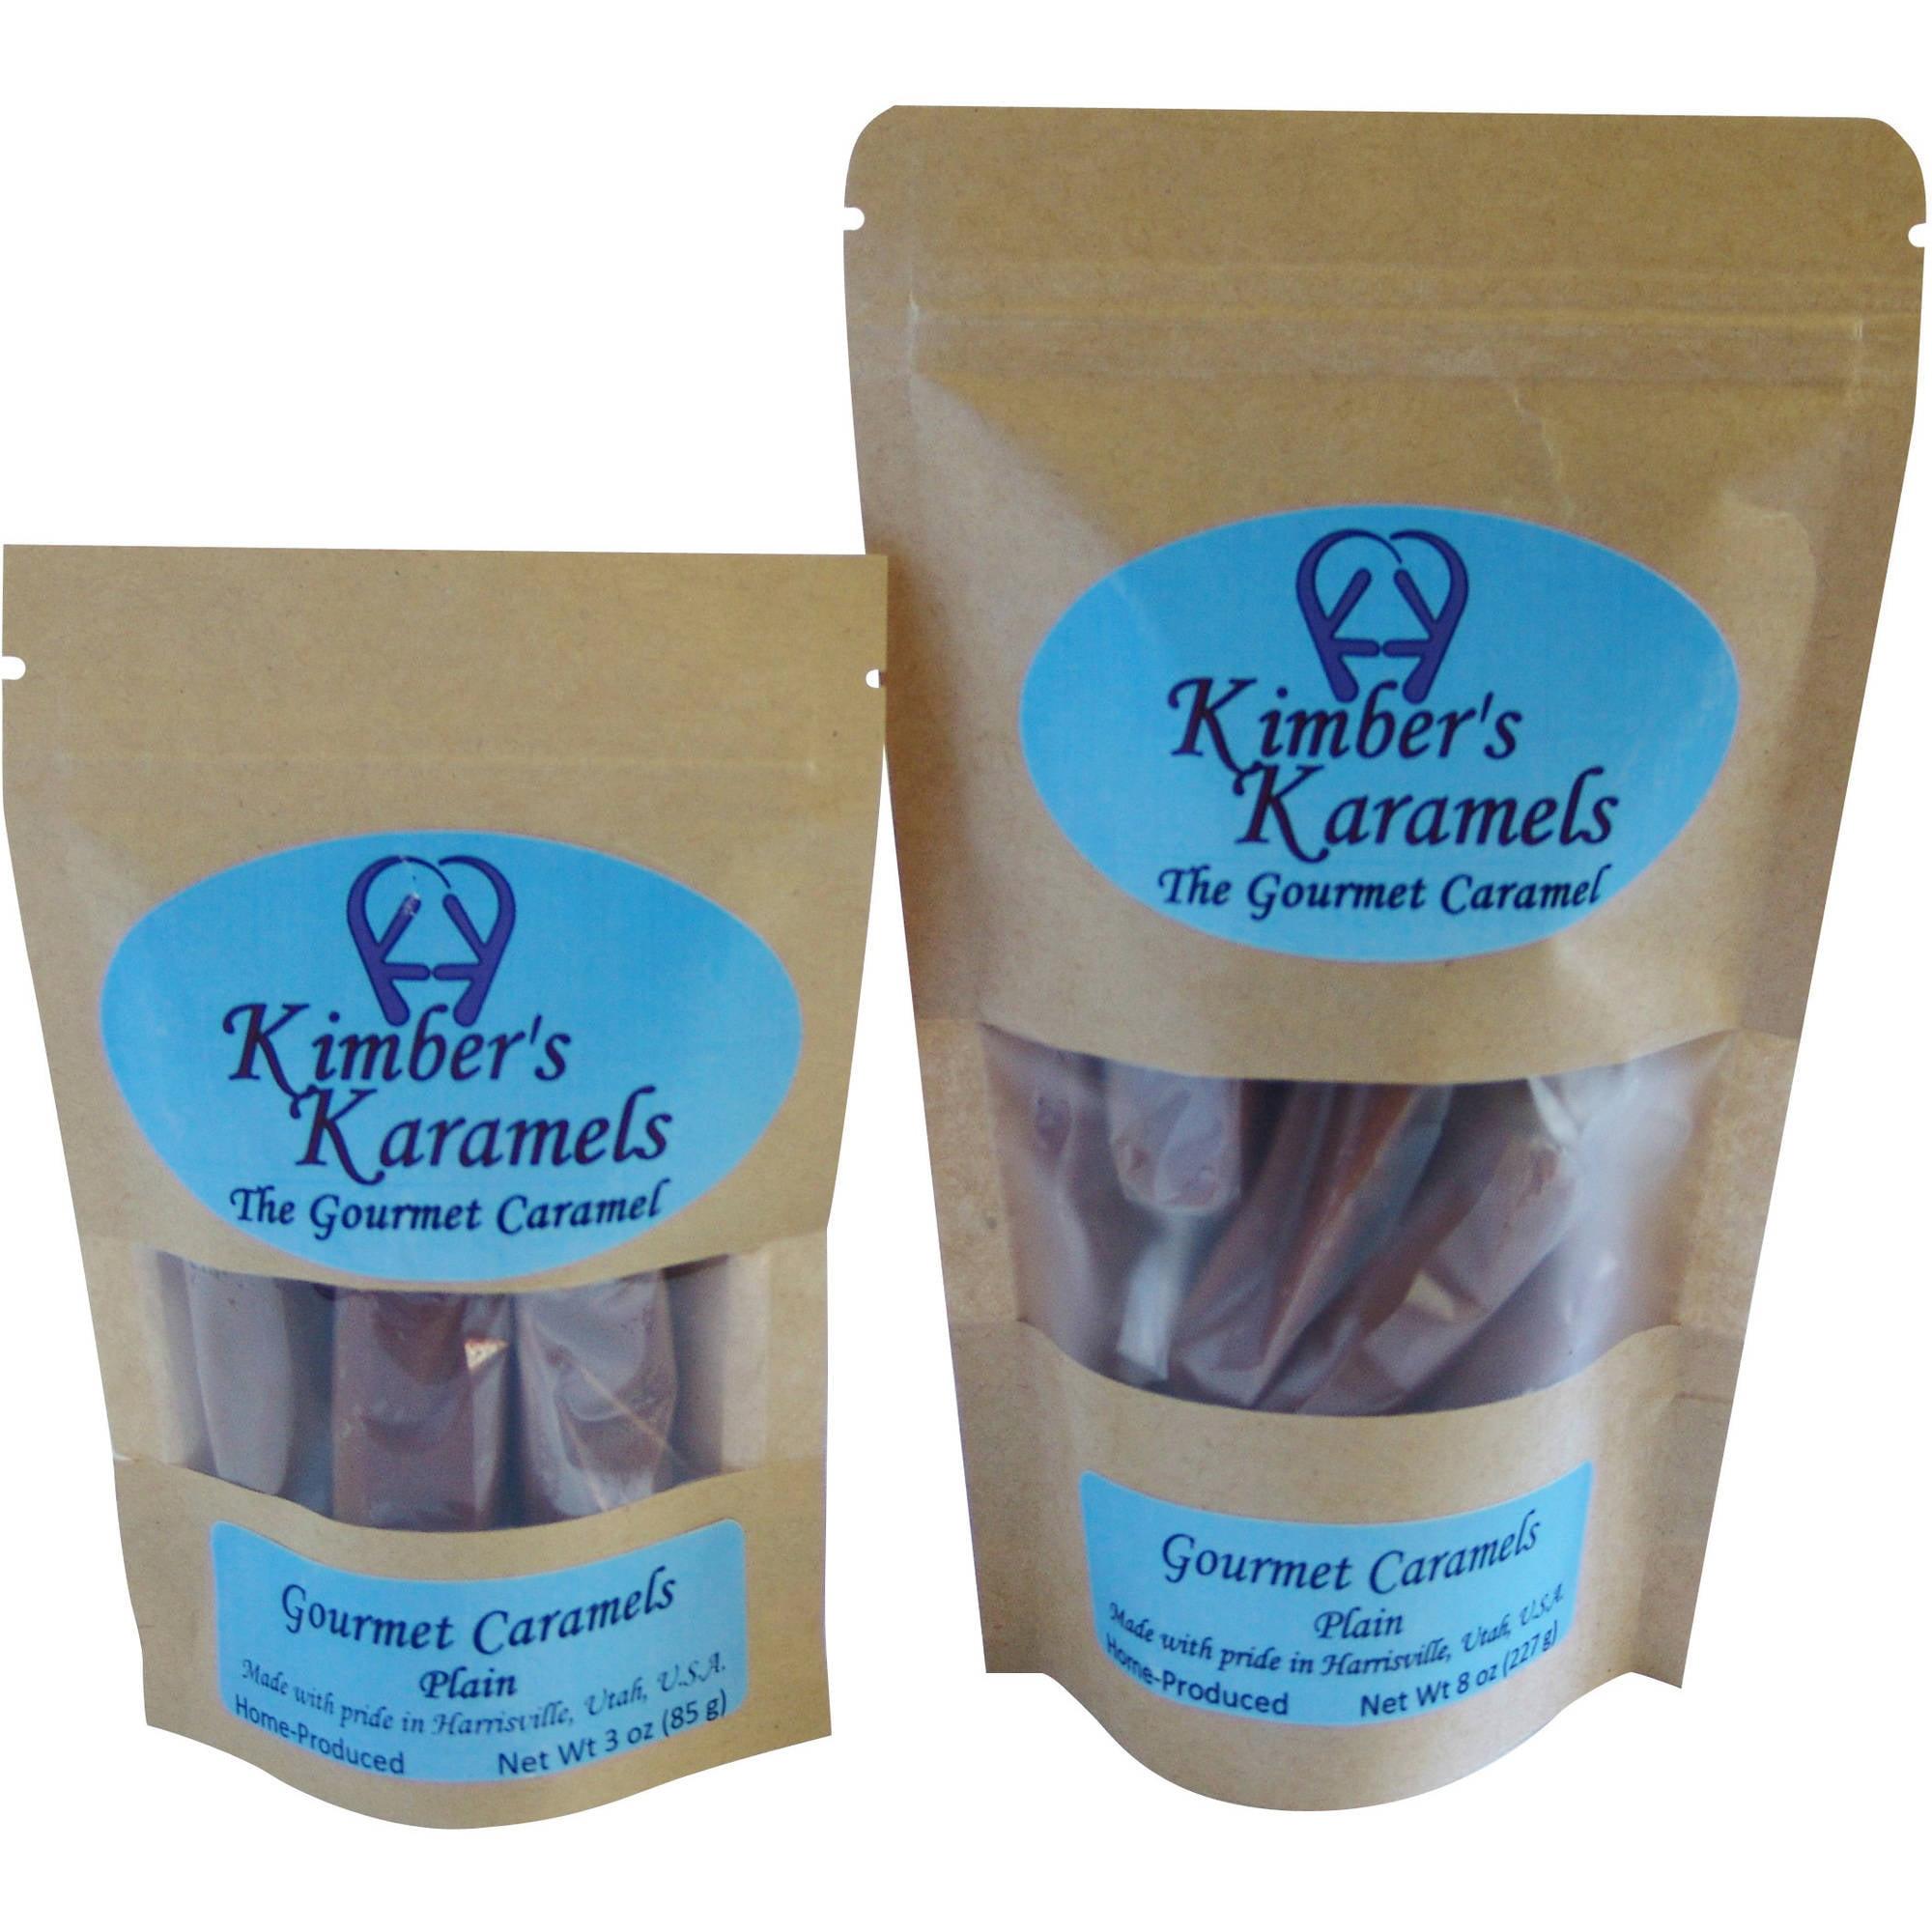 Kimber's Karamels Plain Caramels, 8 oz by Kimber's Karamels LLC